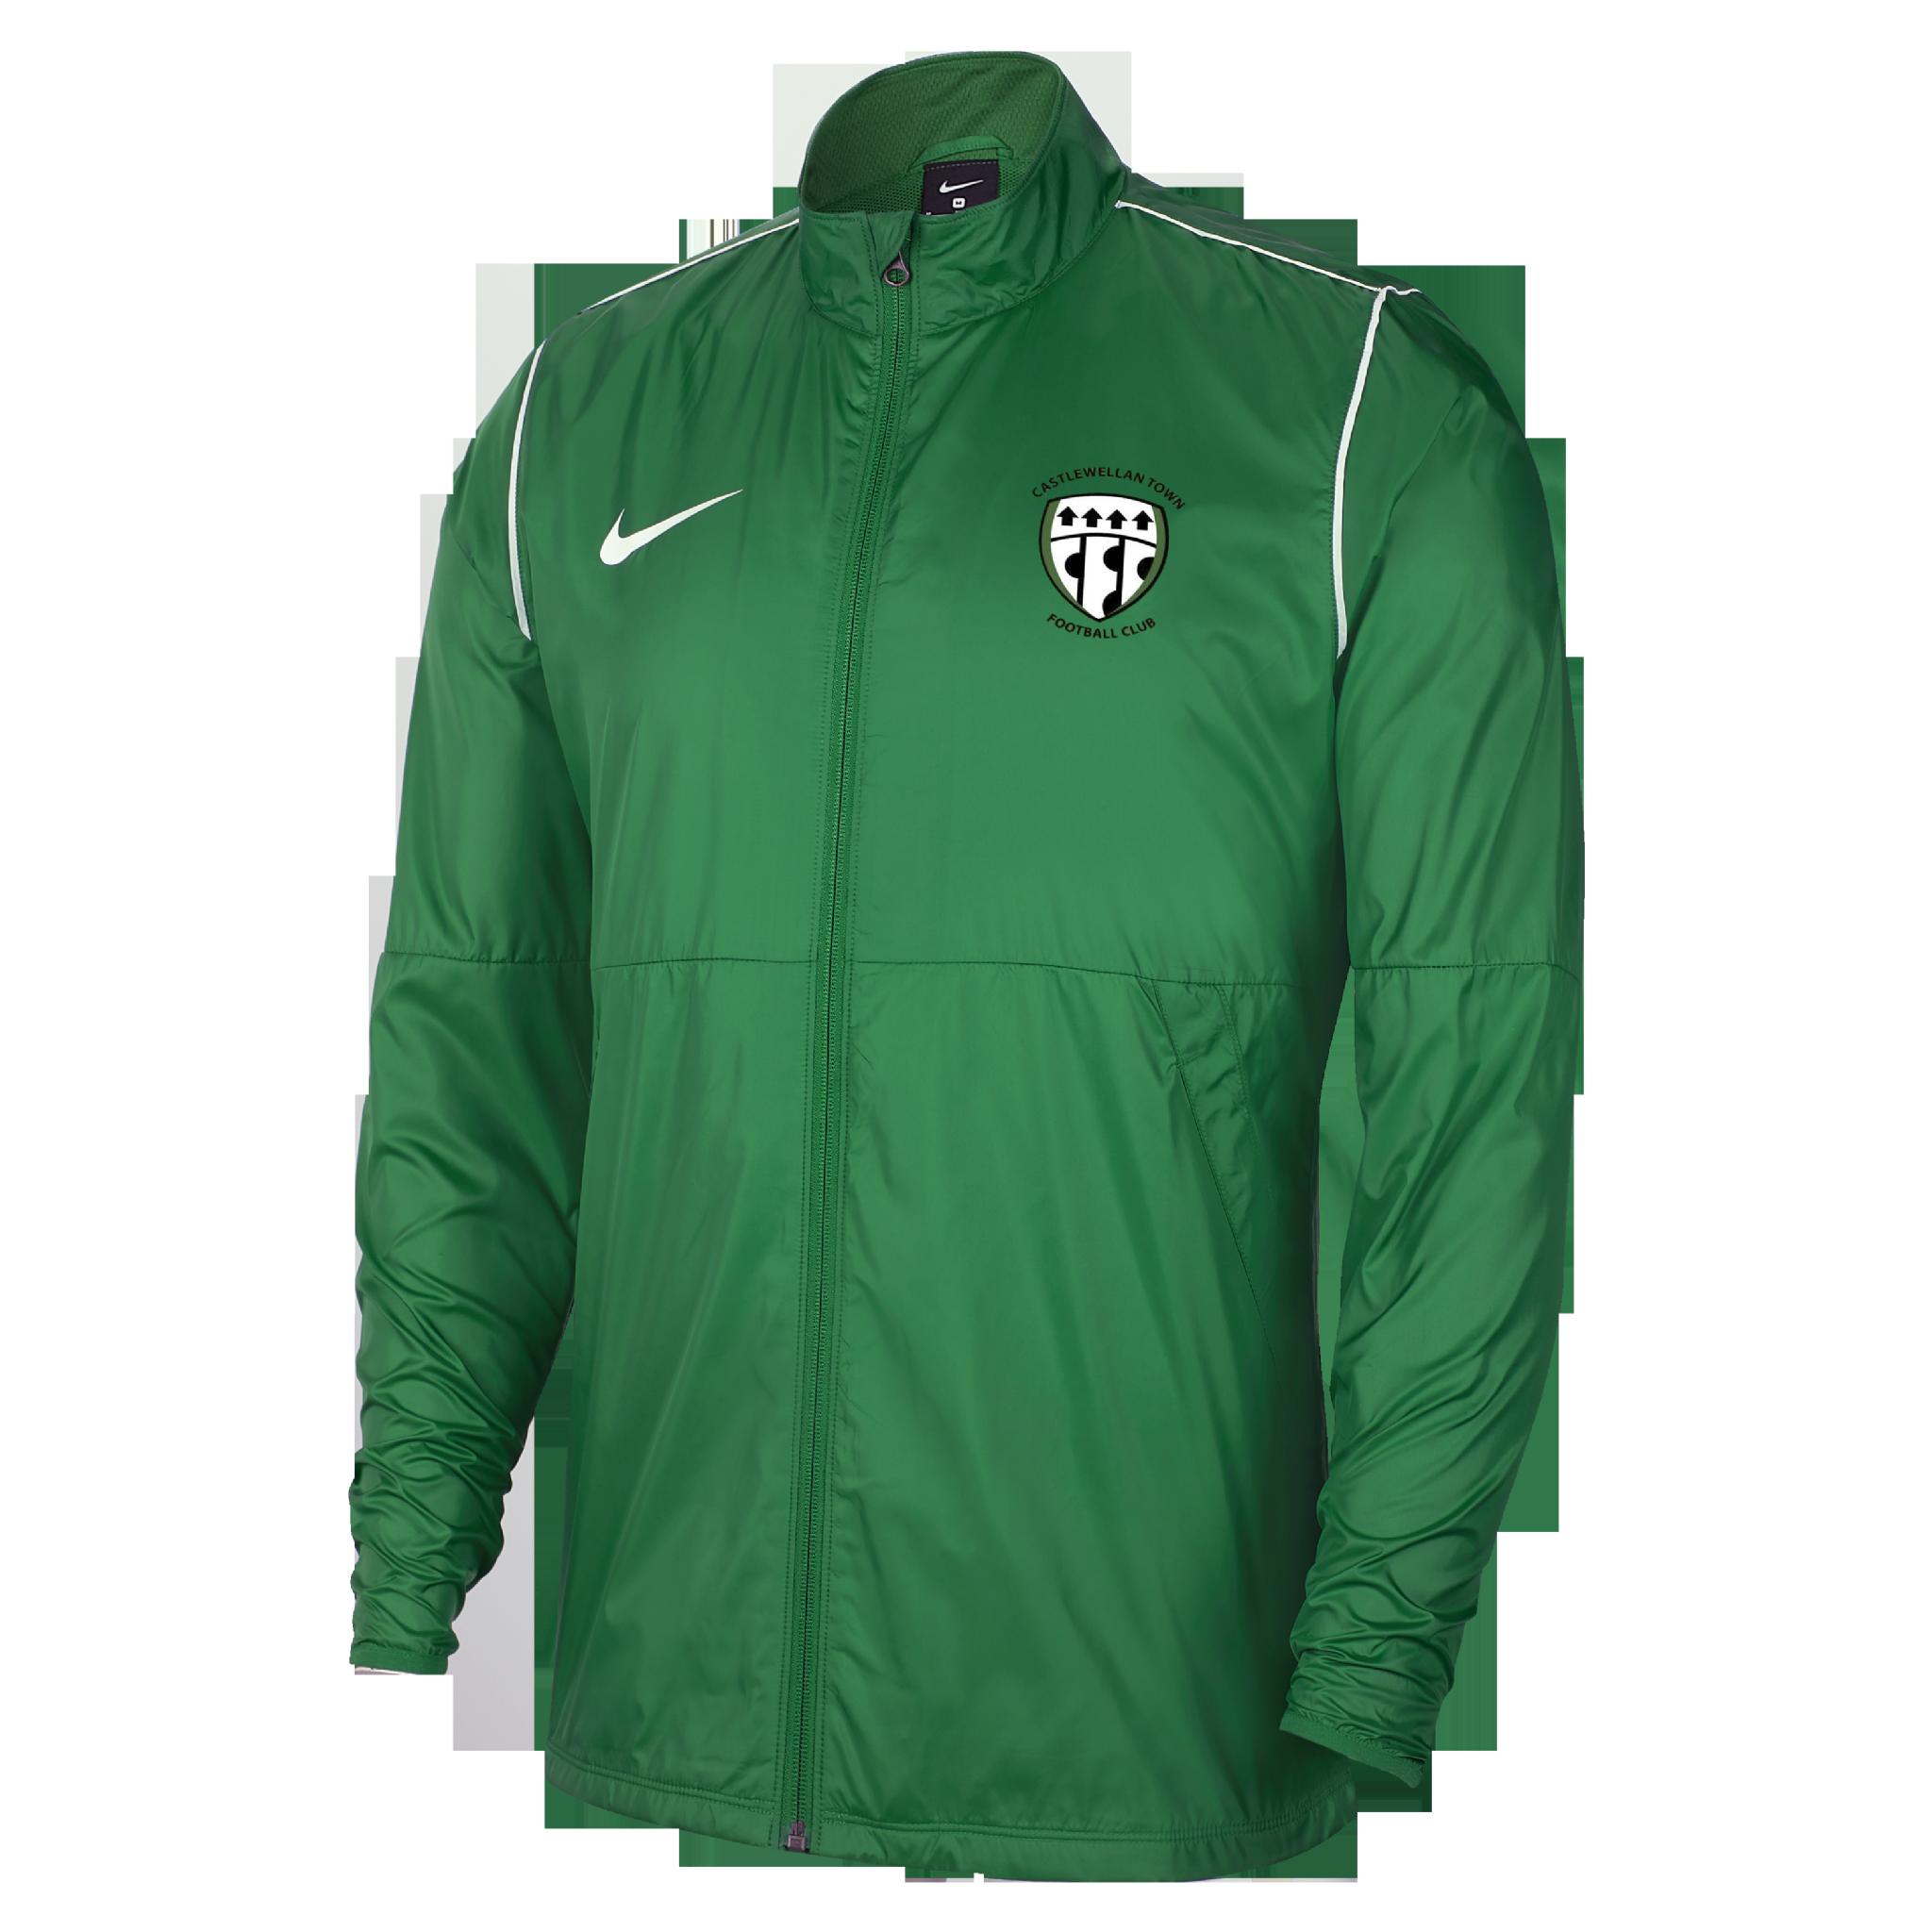 castlewellan park rain jacket 36872 1 p